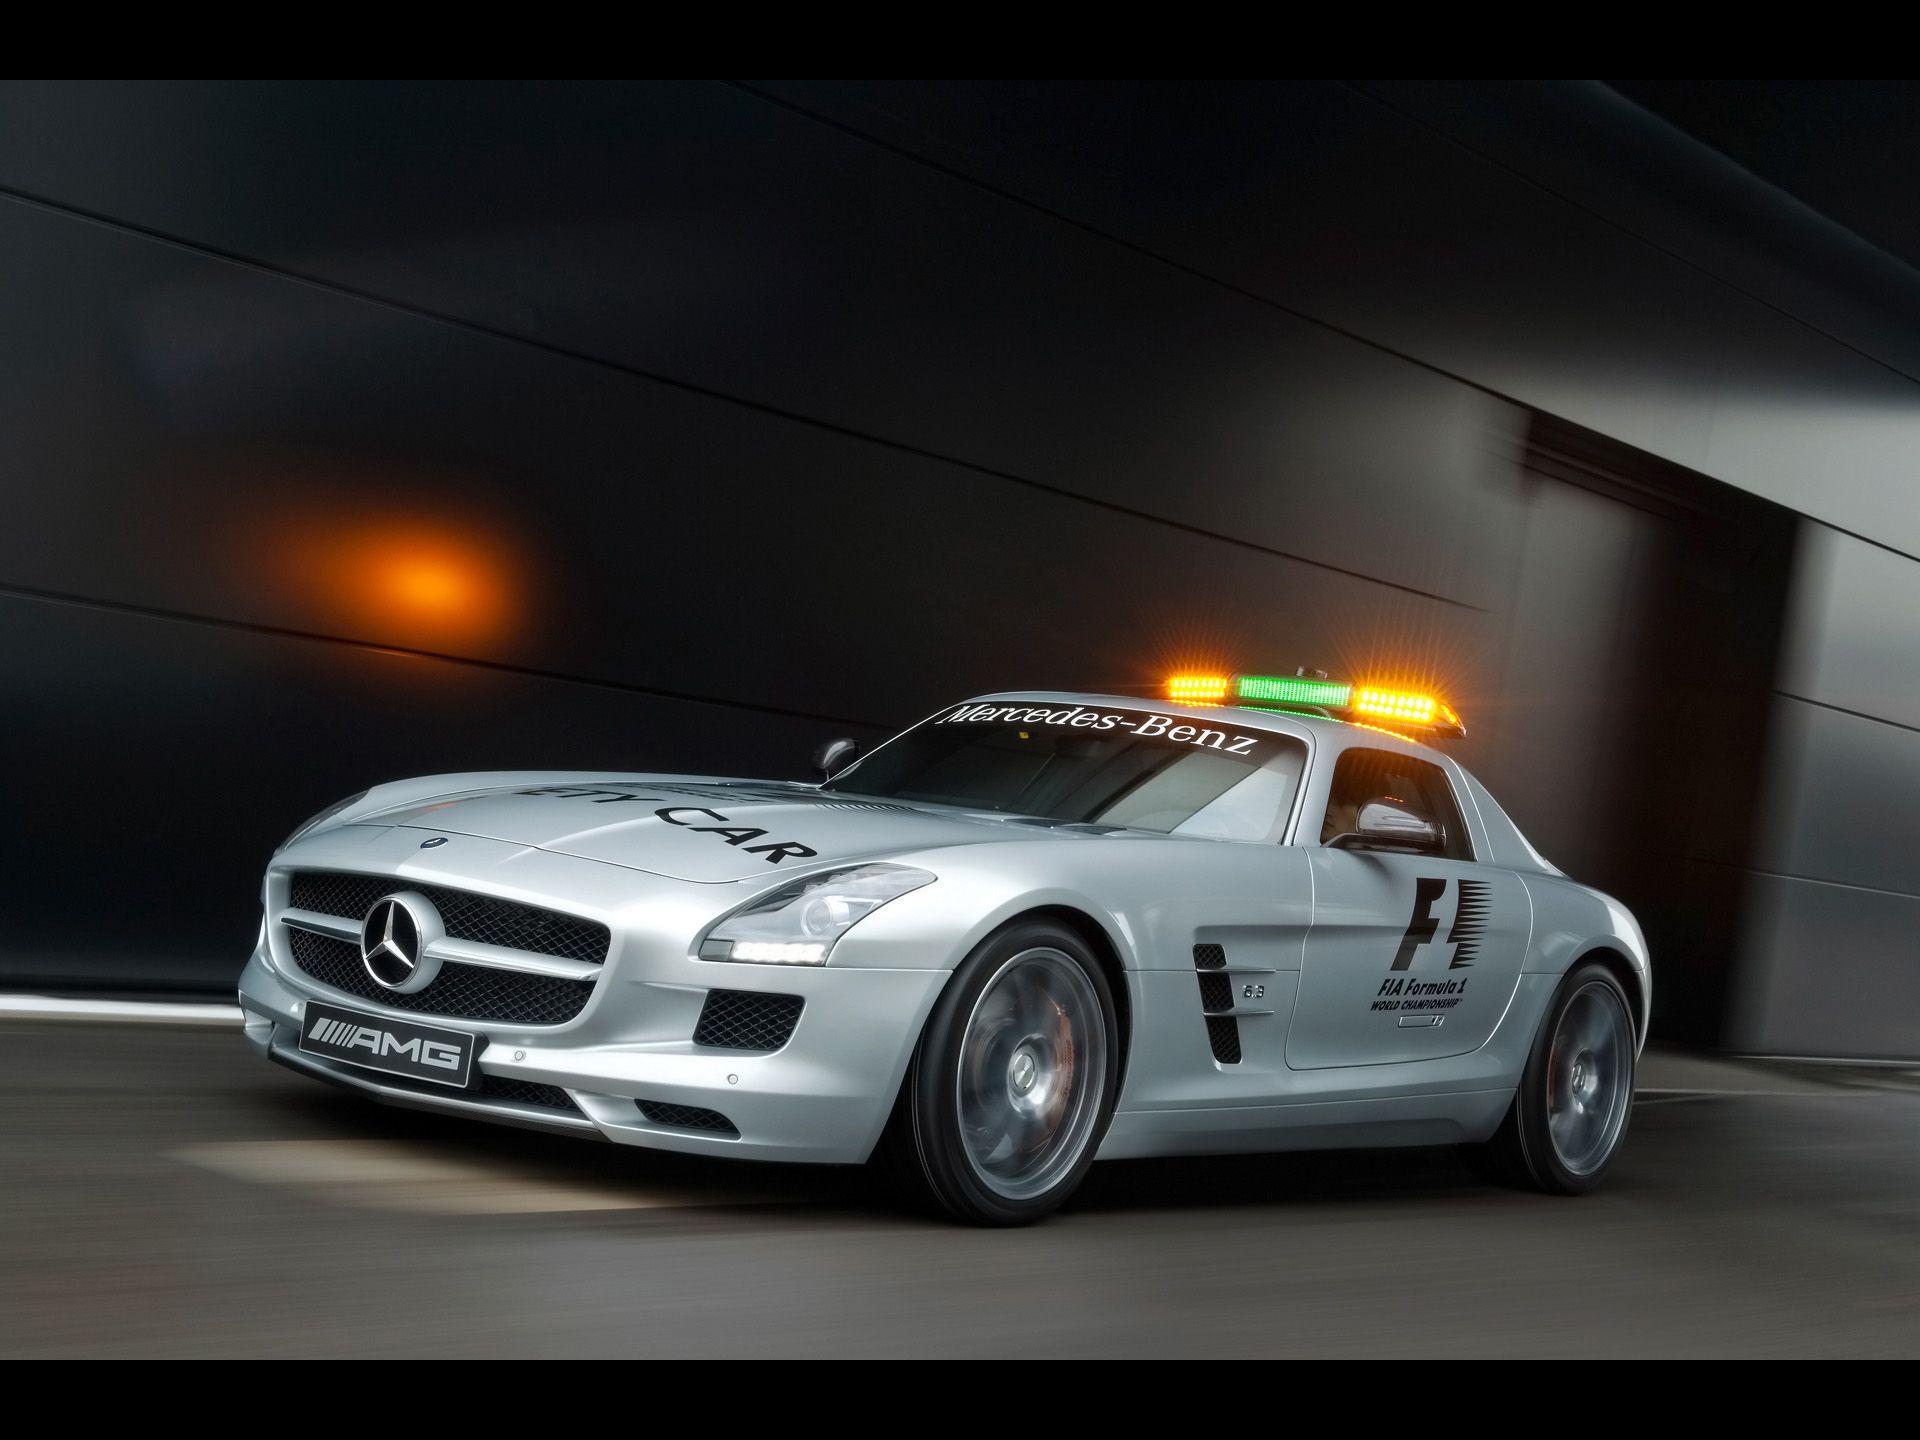 2010 Mercedes Benz Sls Amg F1 Safety Car Mercedes Sls Mercedes